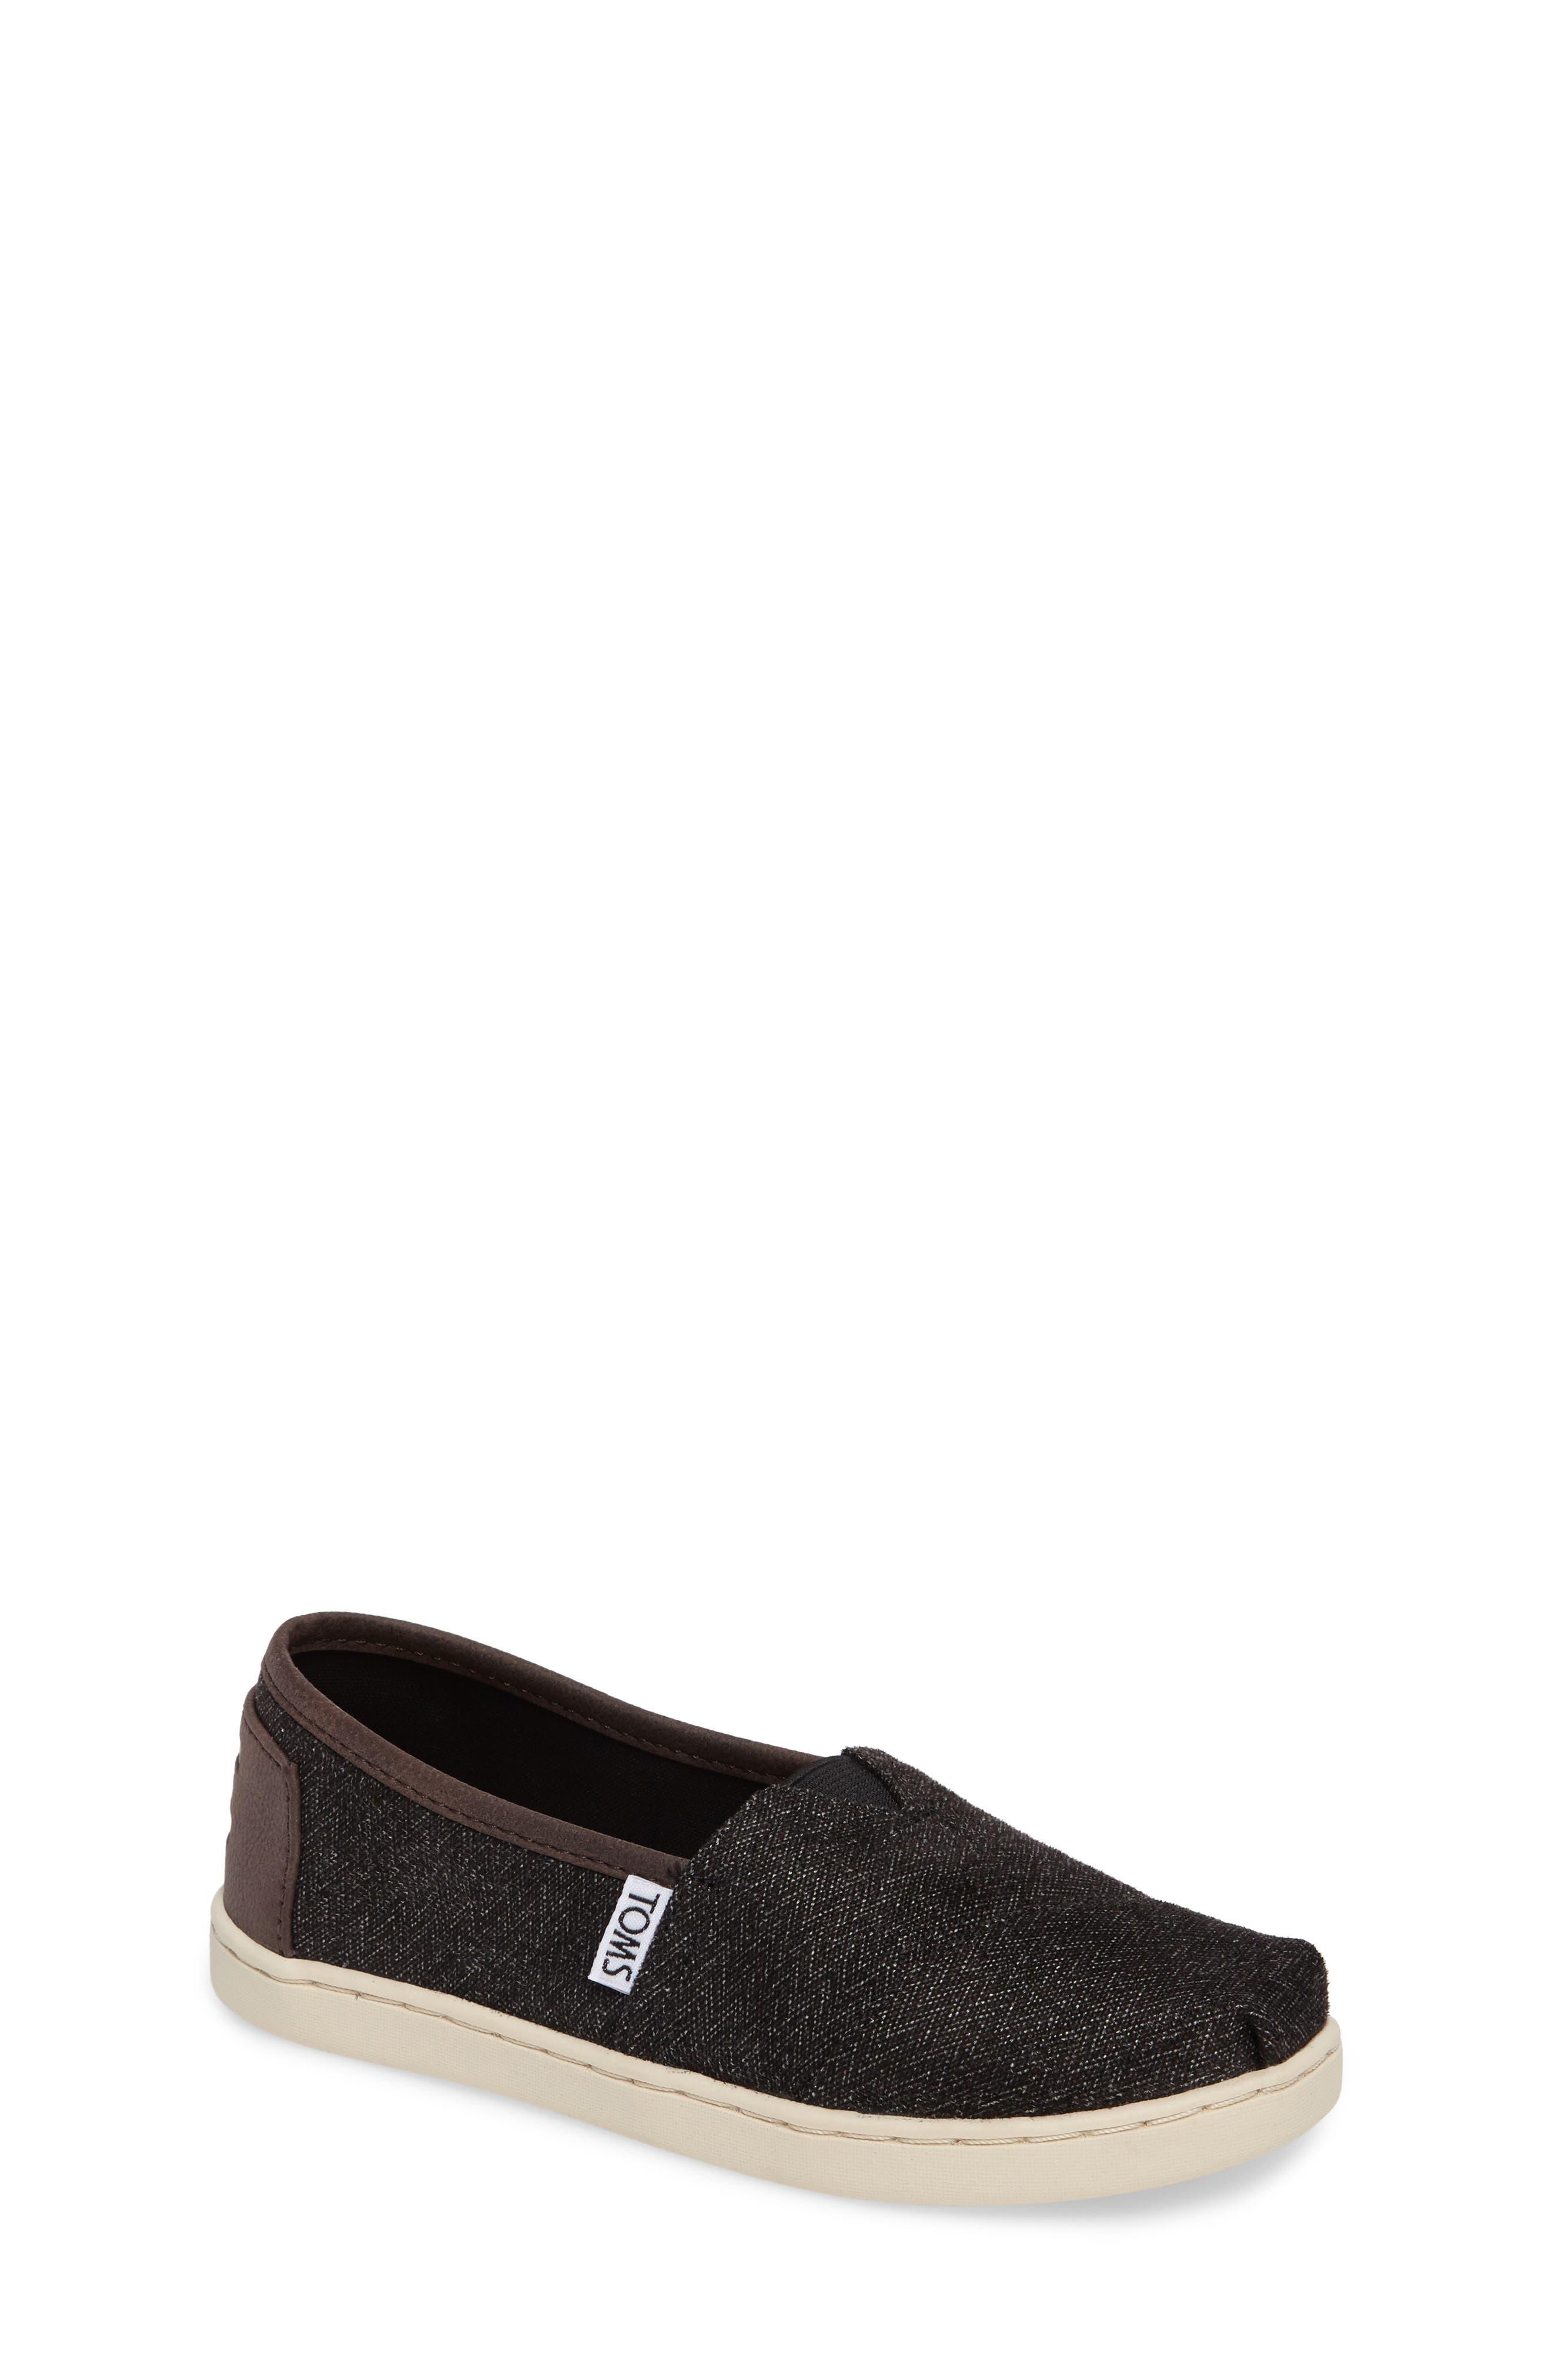 Herringbone Slip-On Sneaker,                             Main thumbnail 1, color,                             021